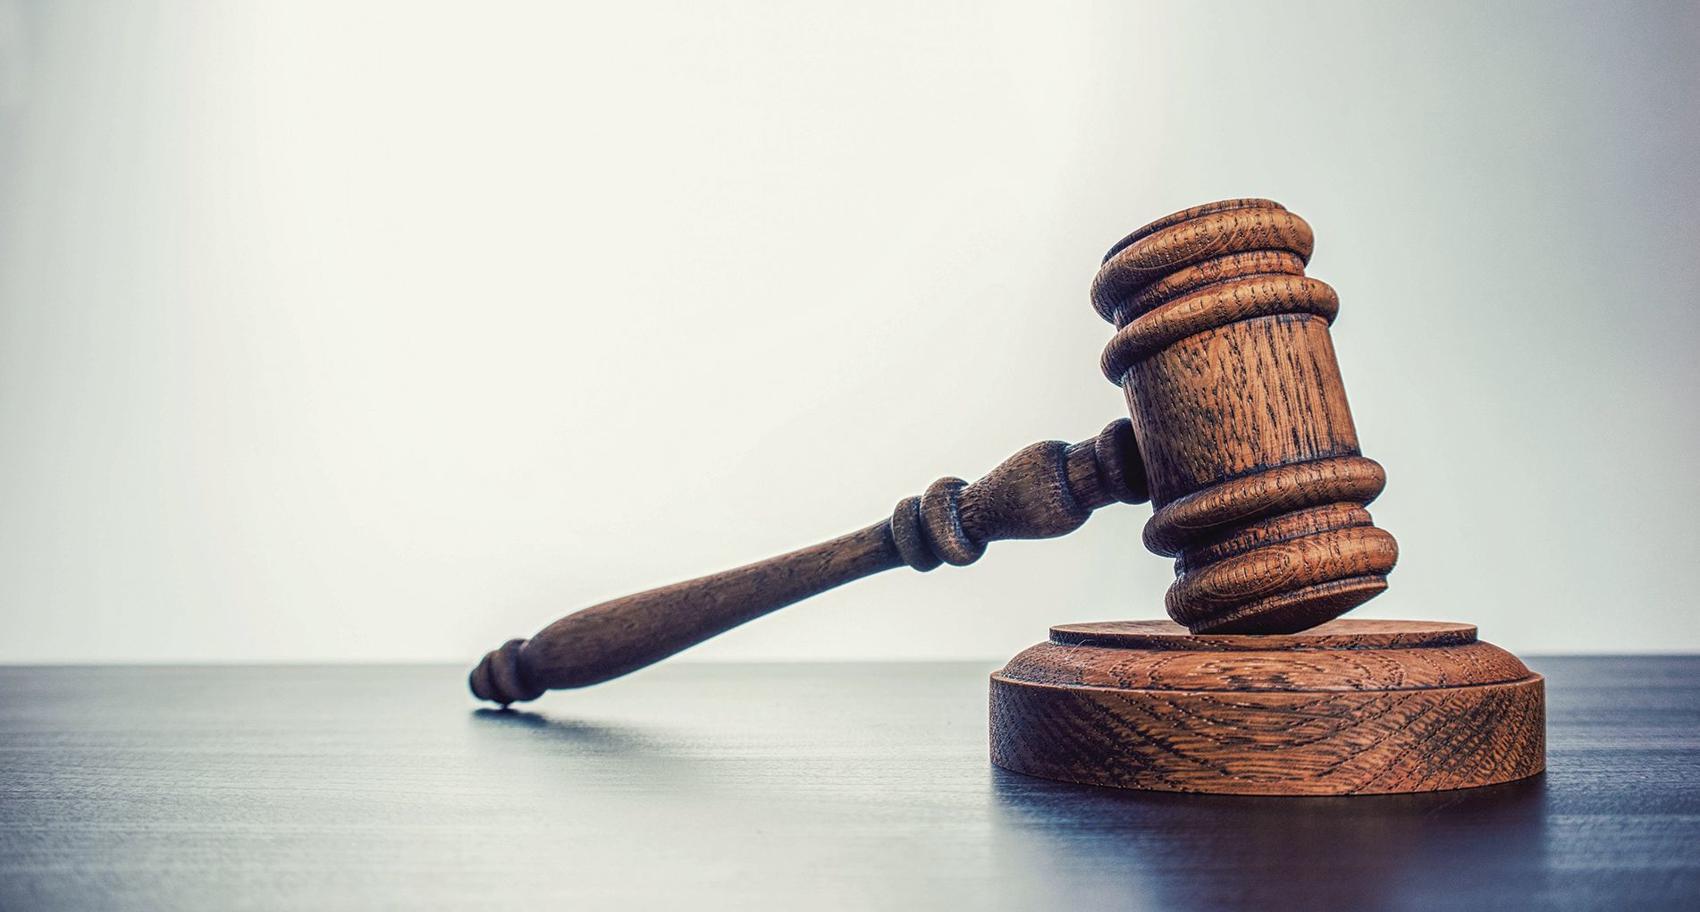 Legislature To Consider Decriminalizing Substances